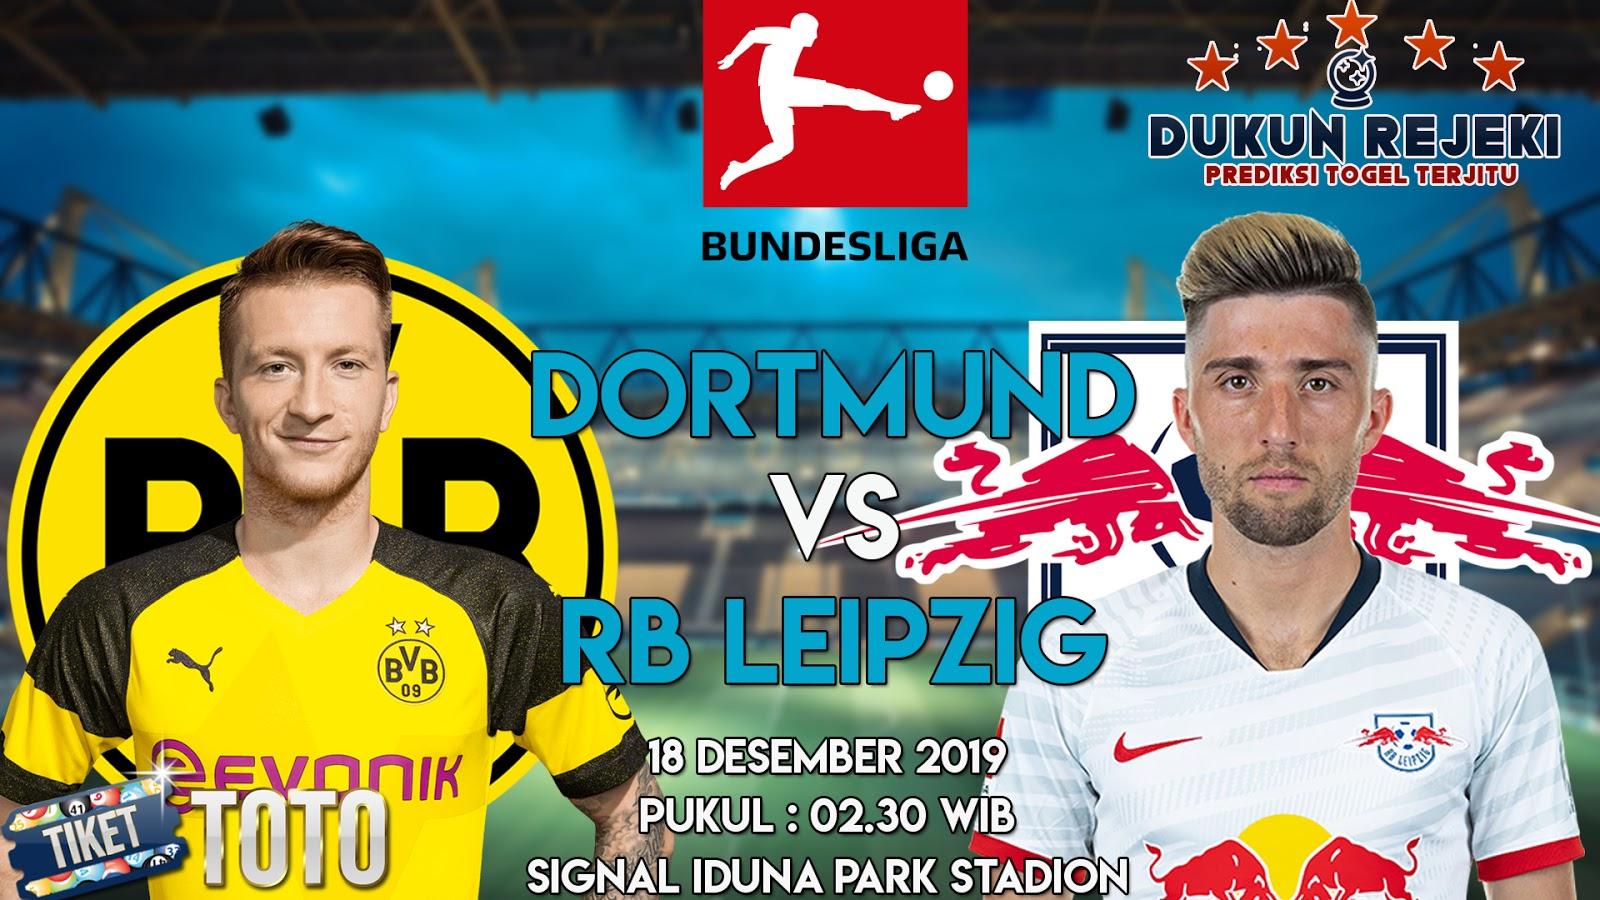 Prediksi Borussia Dortmund vs RB Leipzig 18 Desember 2019